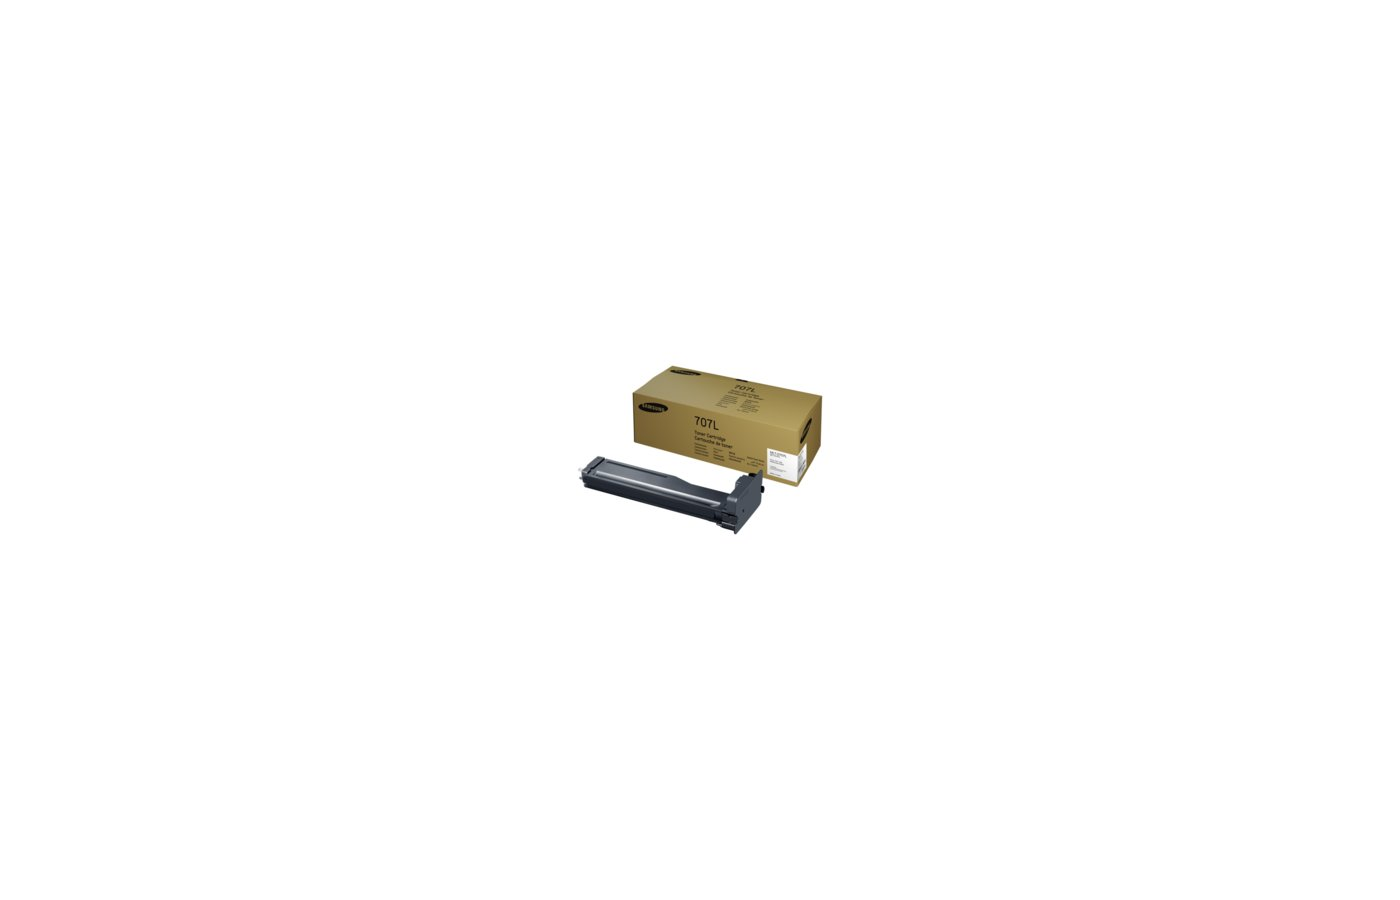 Картридж лазерный Samsung MLT-D707L/SEE черный для SL-K2200/SL-K2200ND